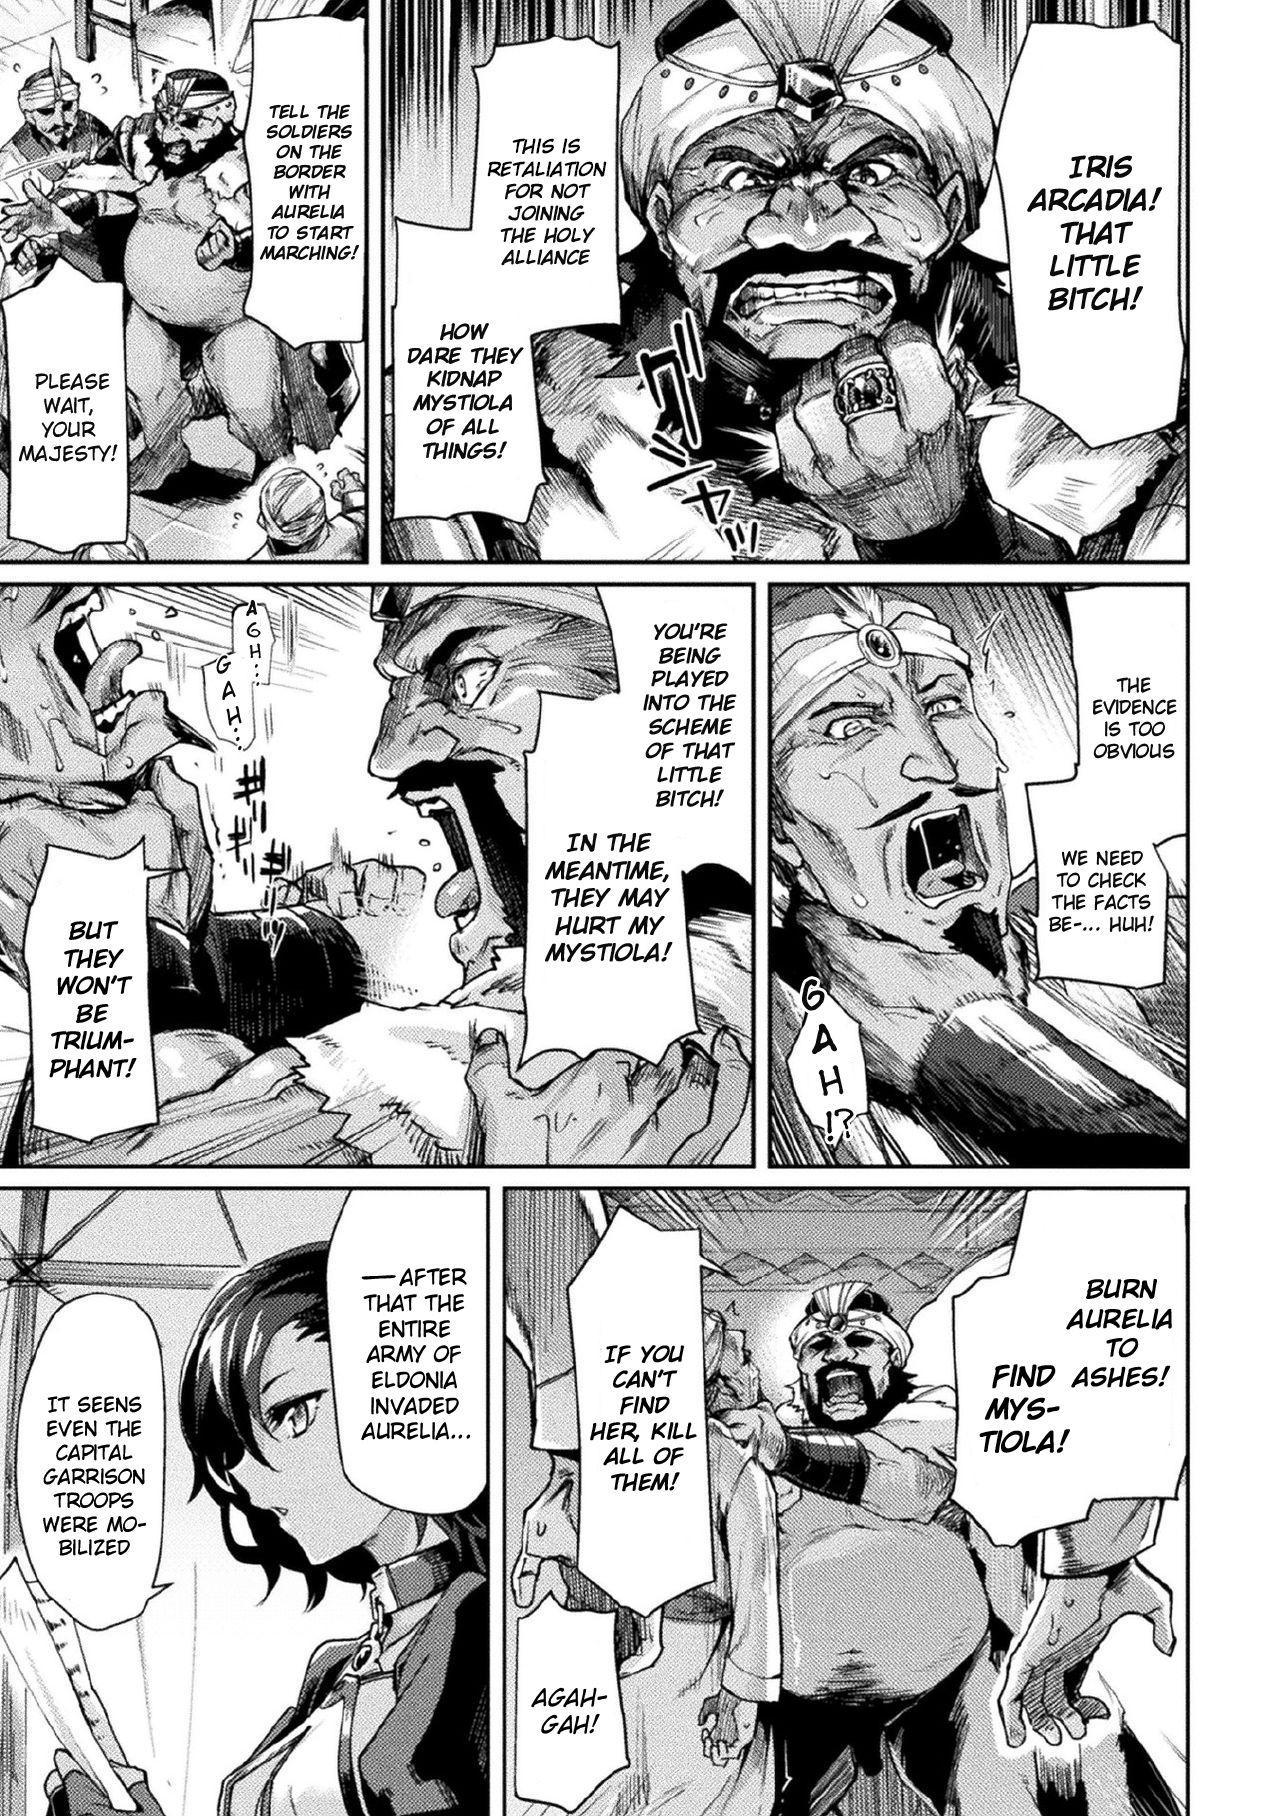 [Tsukitokage] Kuroinu II ~Inyoku ni Somaru Haitoku no Miyako, Futatabi~ THE COMIC Chapter 6 (Kukkoro Heroines Vol. 7) [English] [Klub Kemoner] [Decensored] [Digital] 4